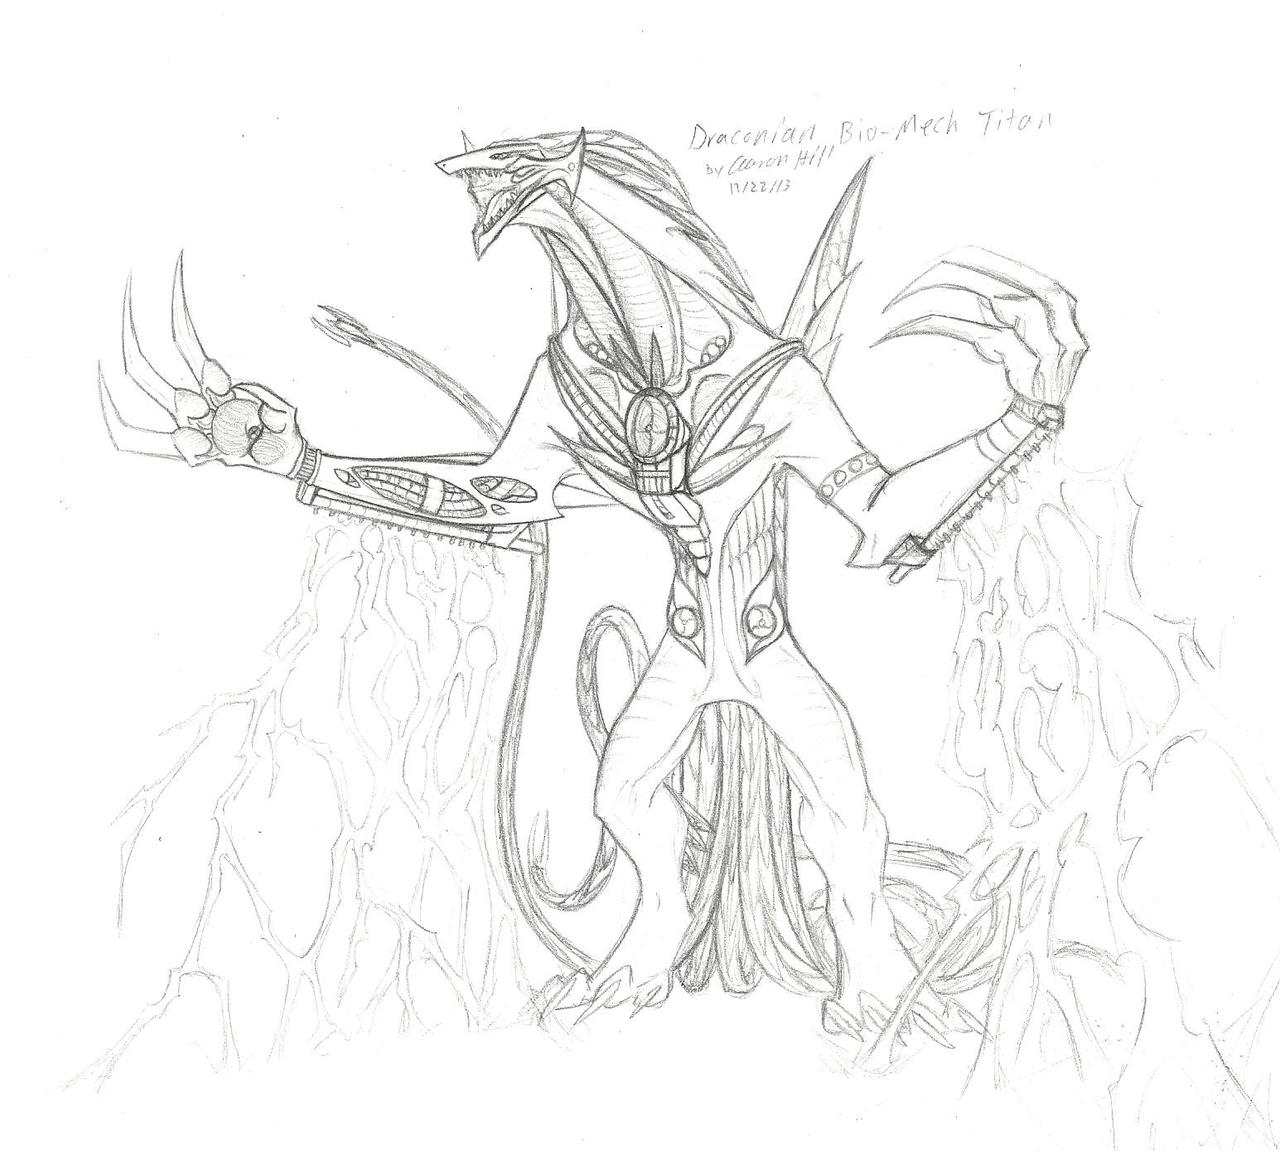 Draconian Bio-mech Titan by Sorteagan